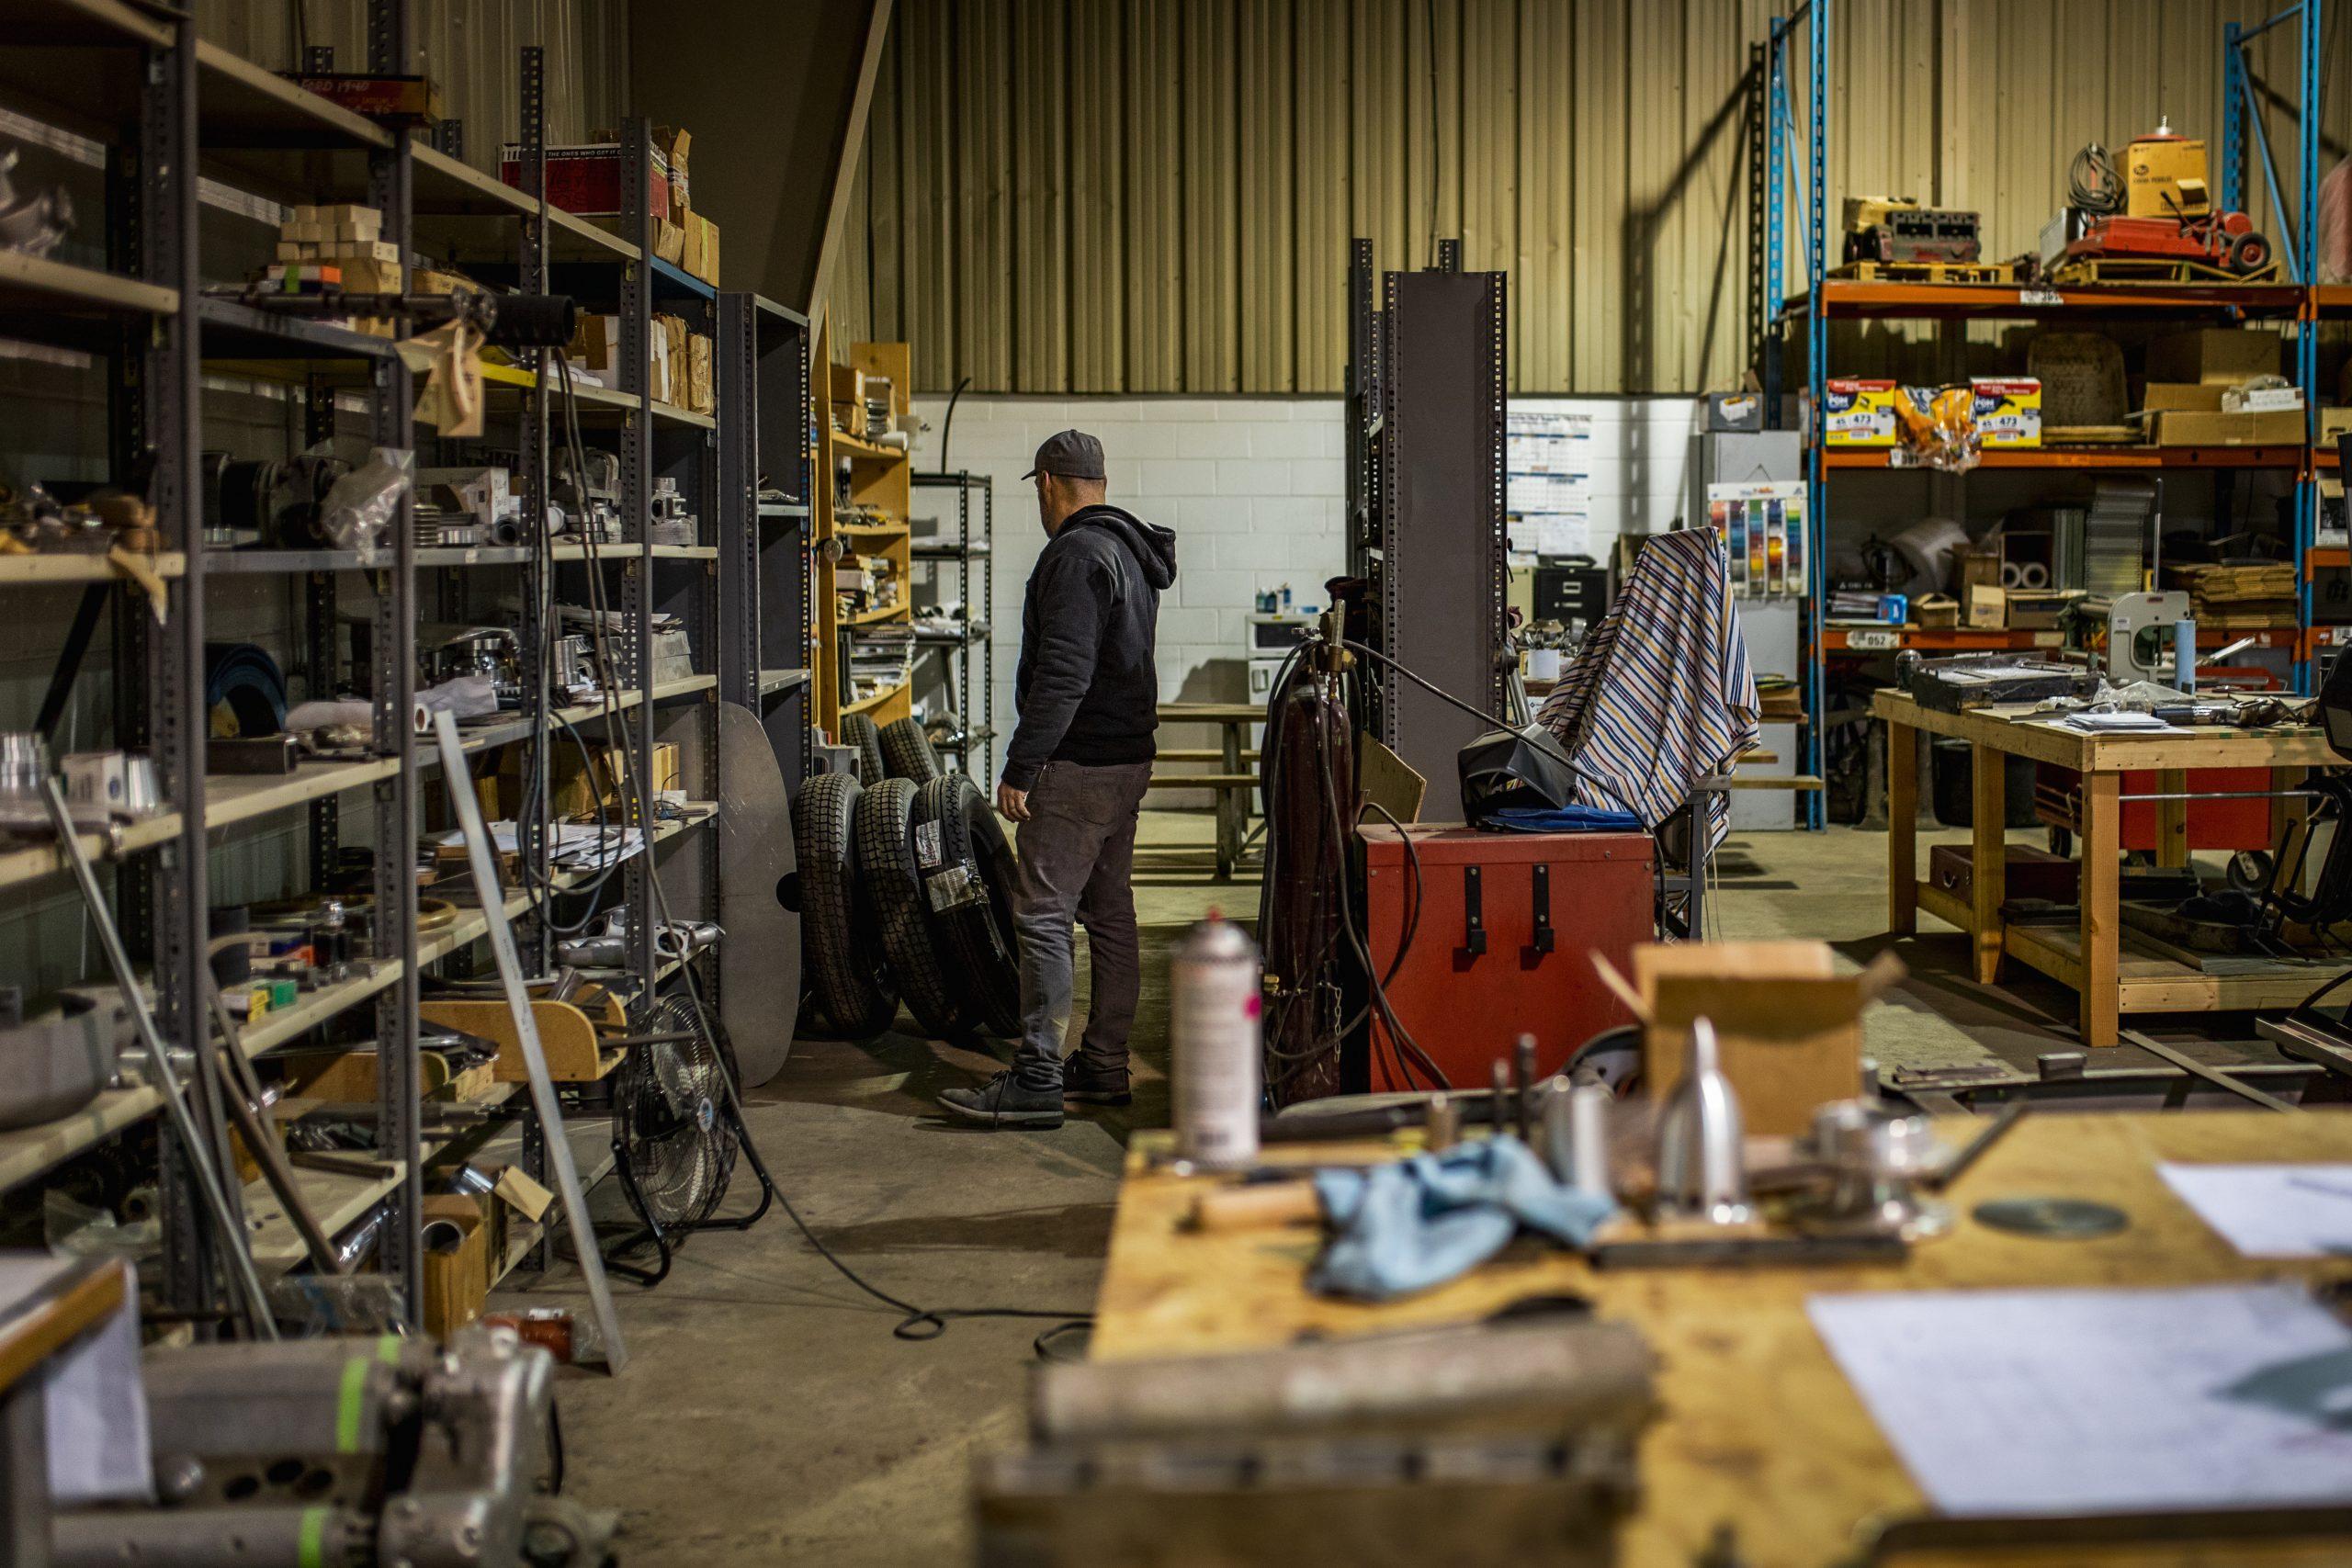 machine shop man searching shelves